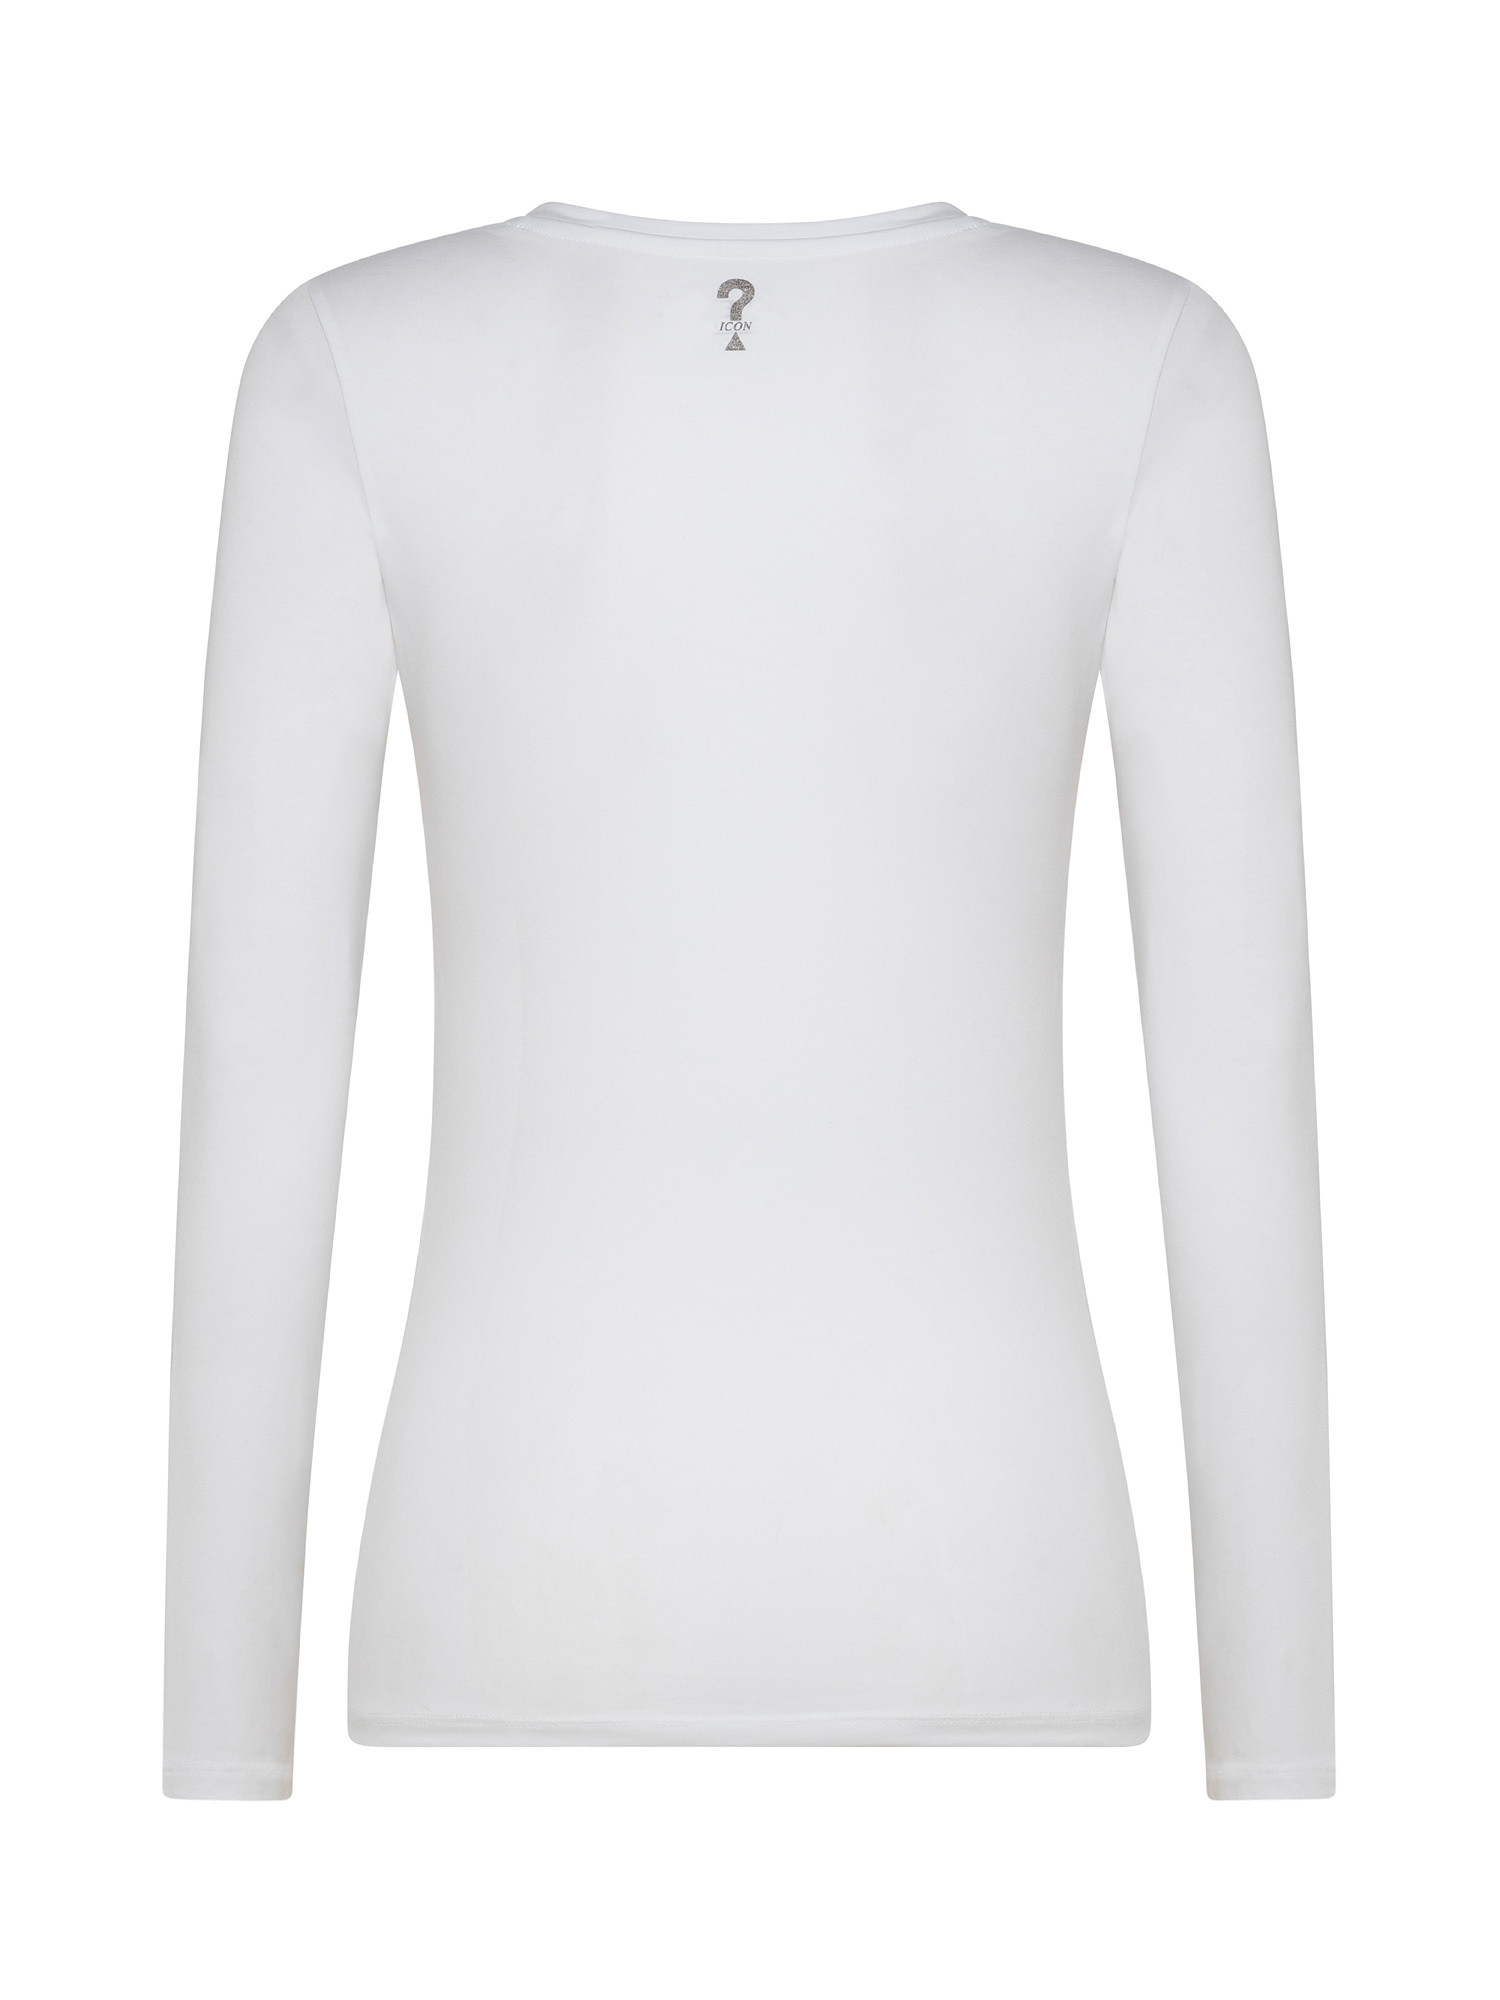 T-shirt, Bianco, large image number 1